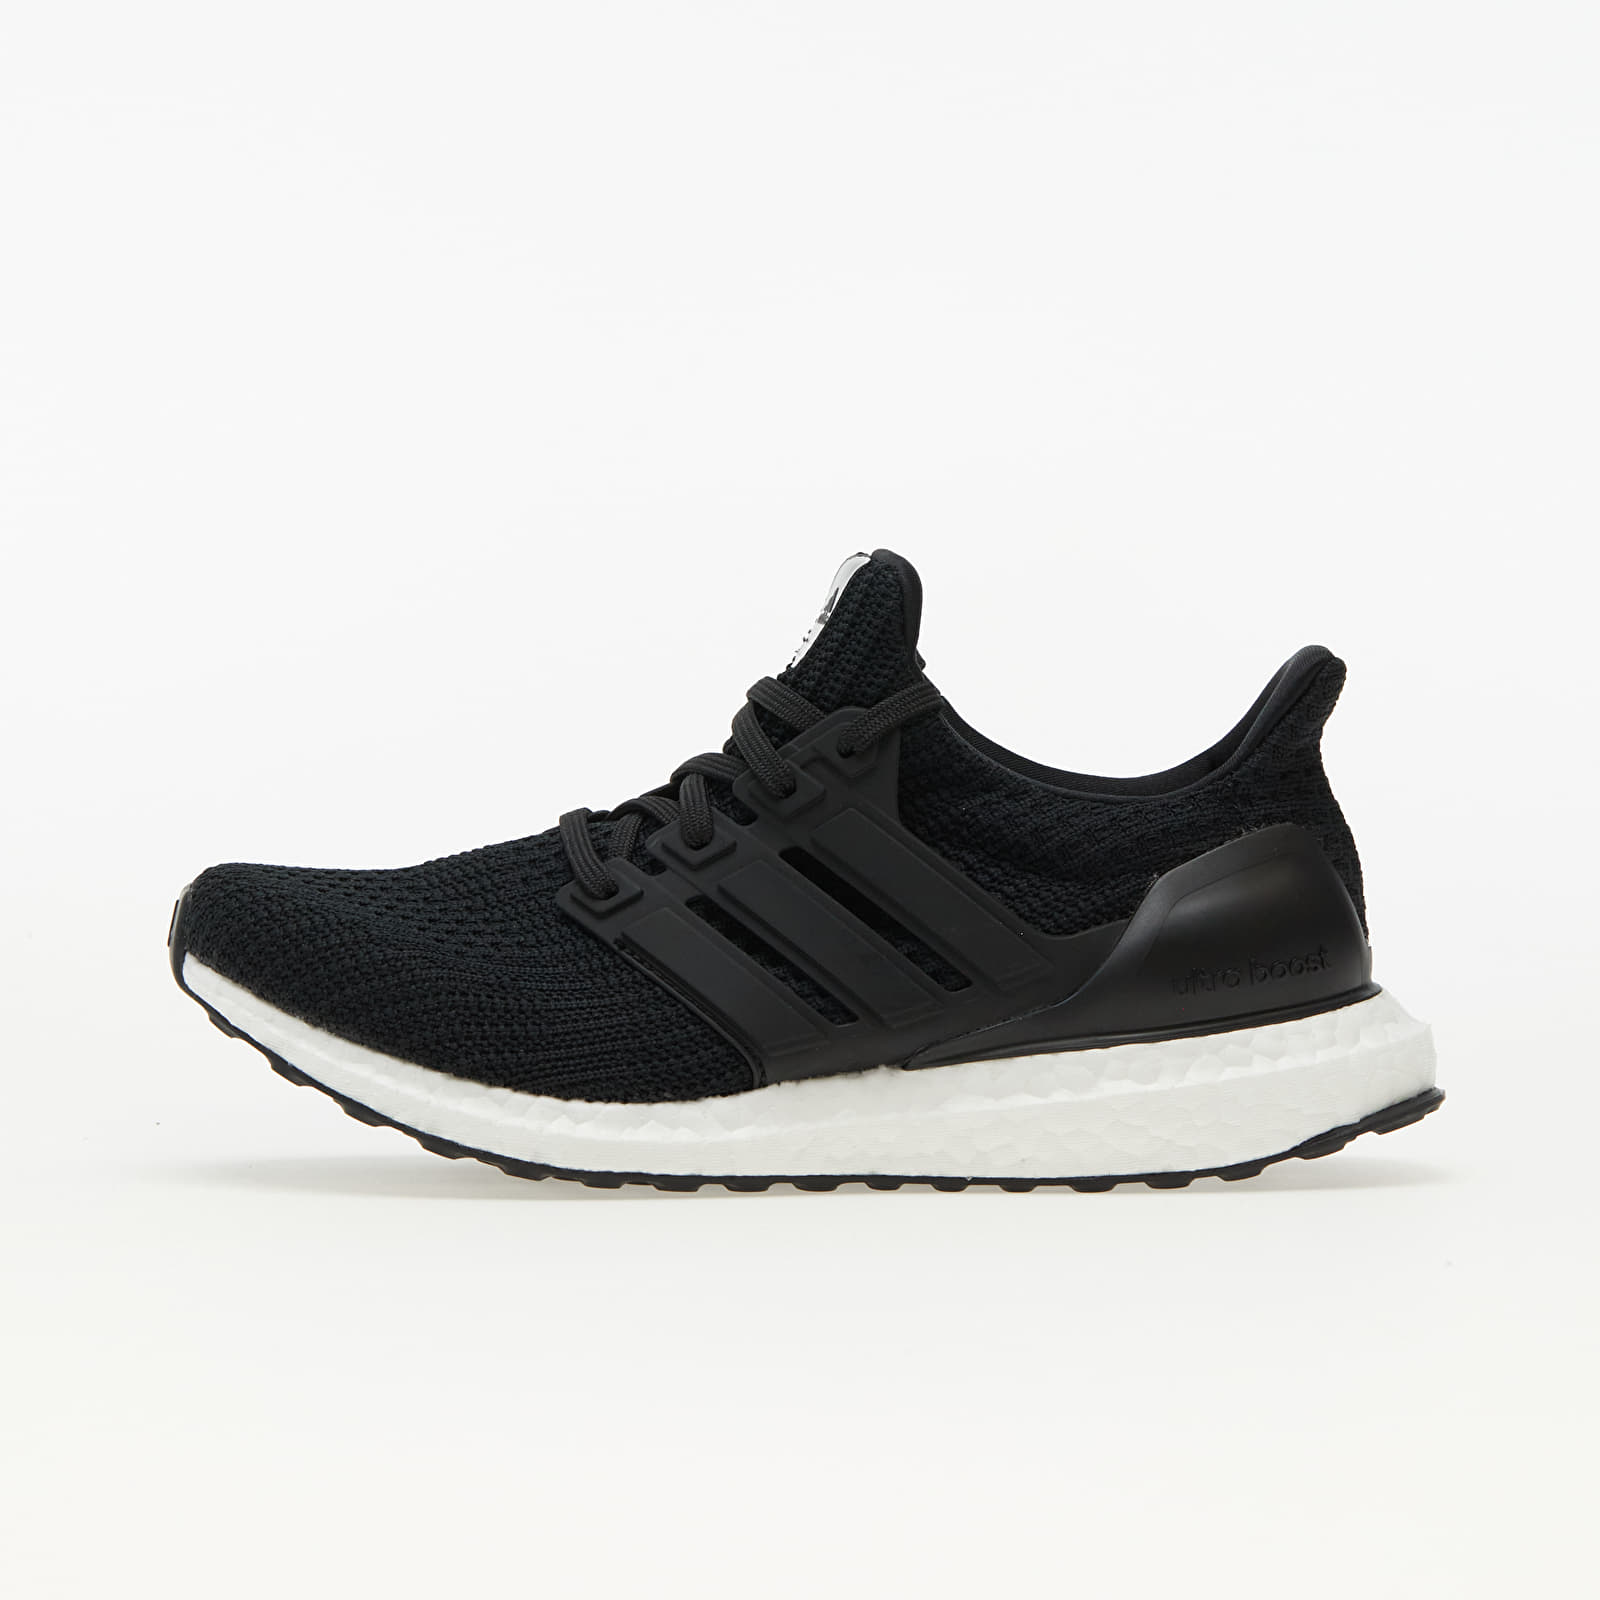 adidas UltraBOOST 4.0 DNA W Core Black/ Core Black/ Ftw White FY9123